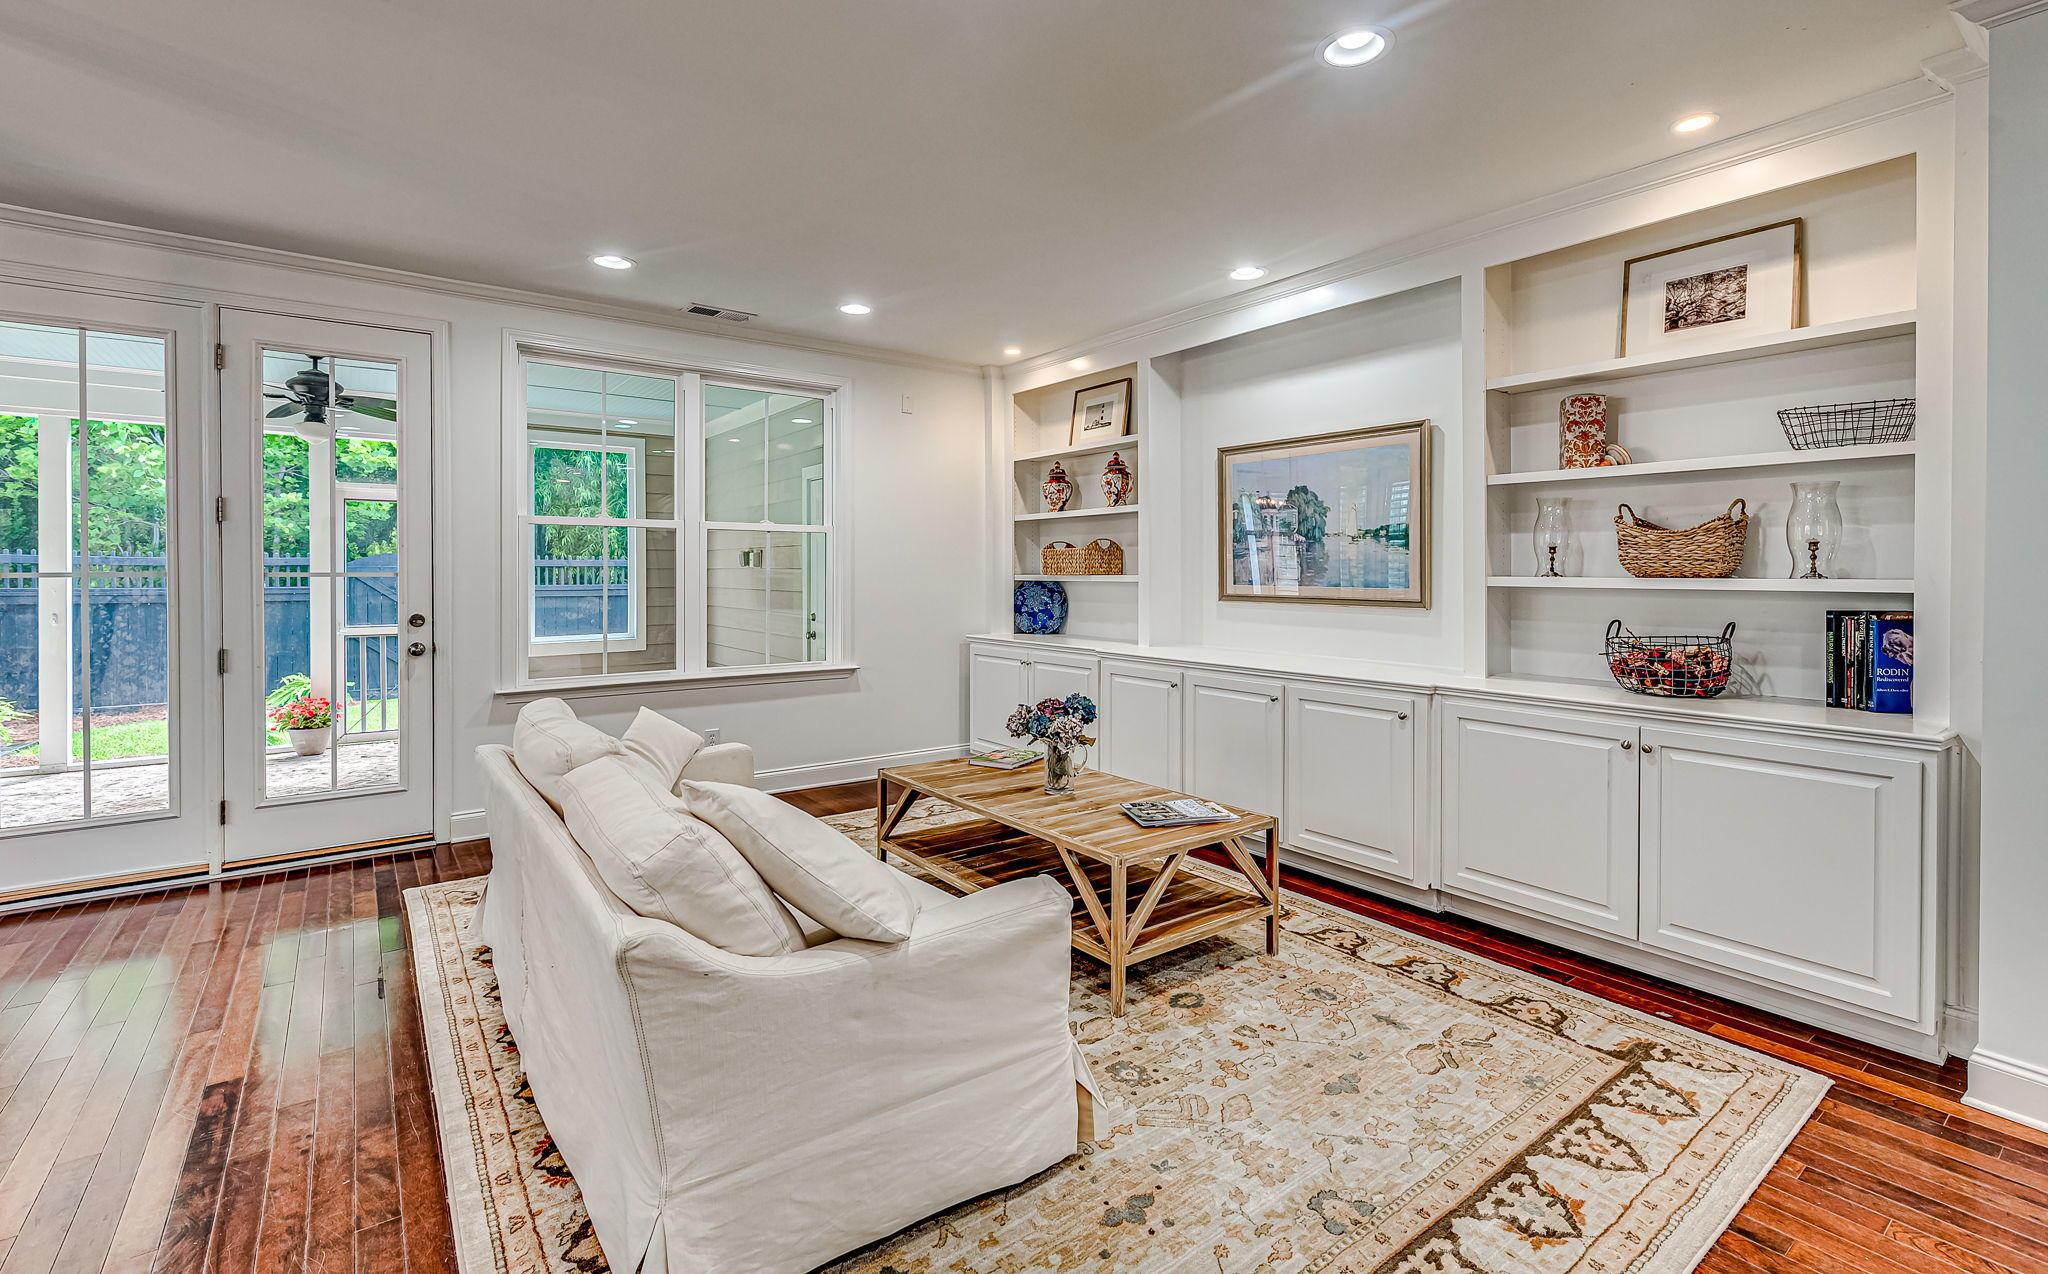 Dunes West Homes For Sale - 2476 Kings Gate, Mount Pleasant, SC - 41